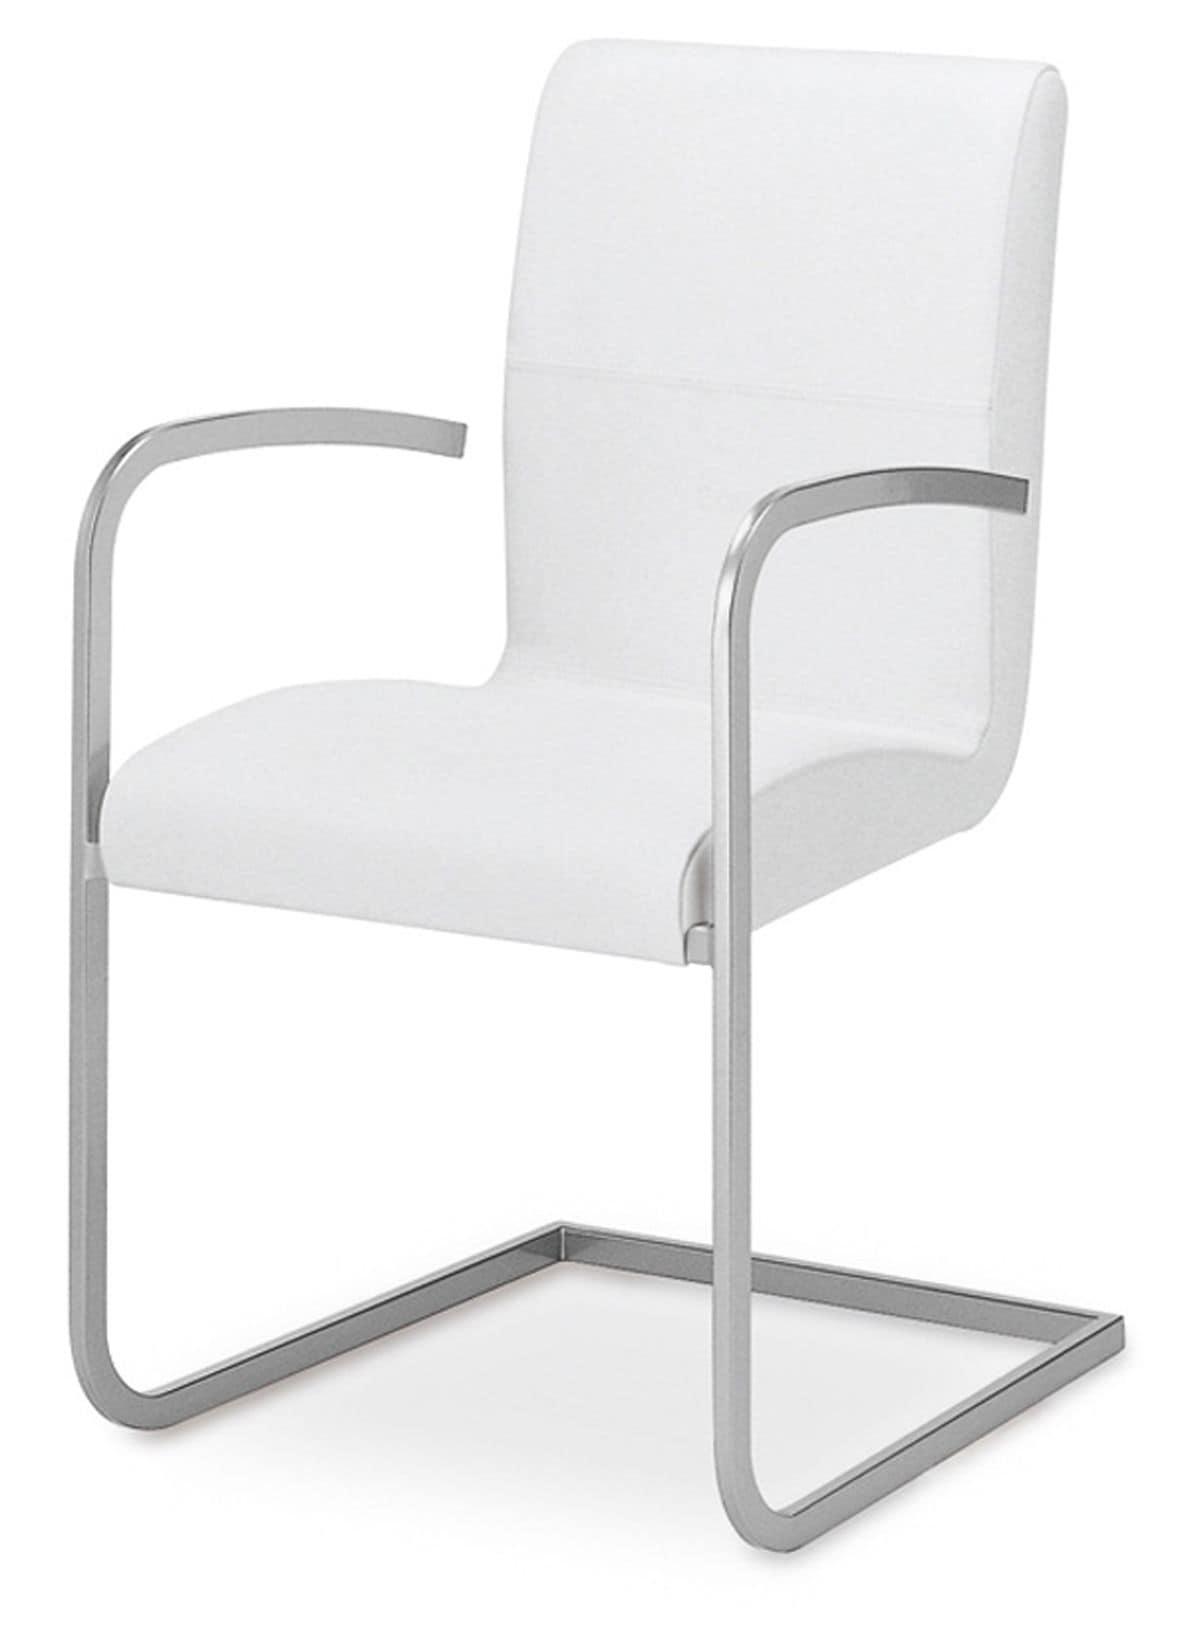 Sedia imbottita con struttura in metallo braccioli e base for Sedie imbottite moderne